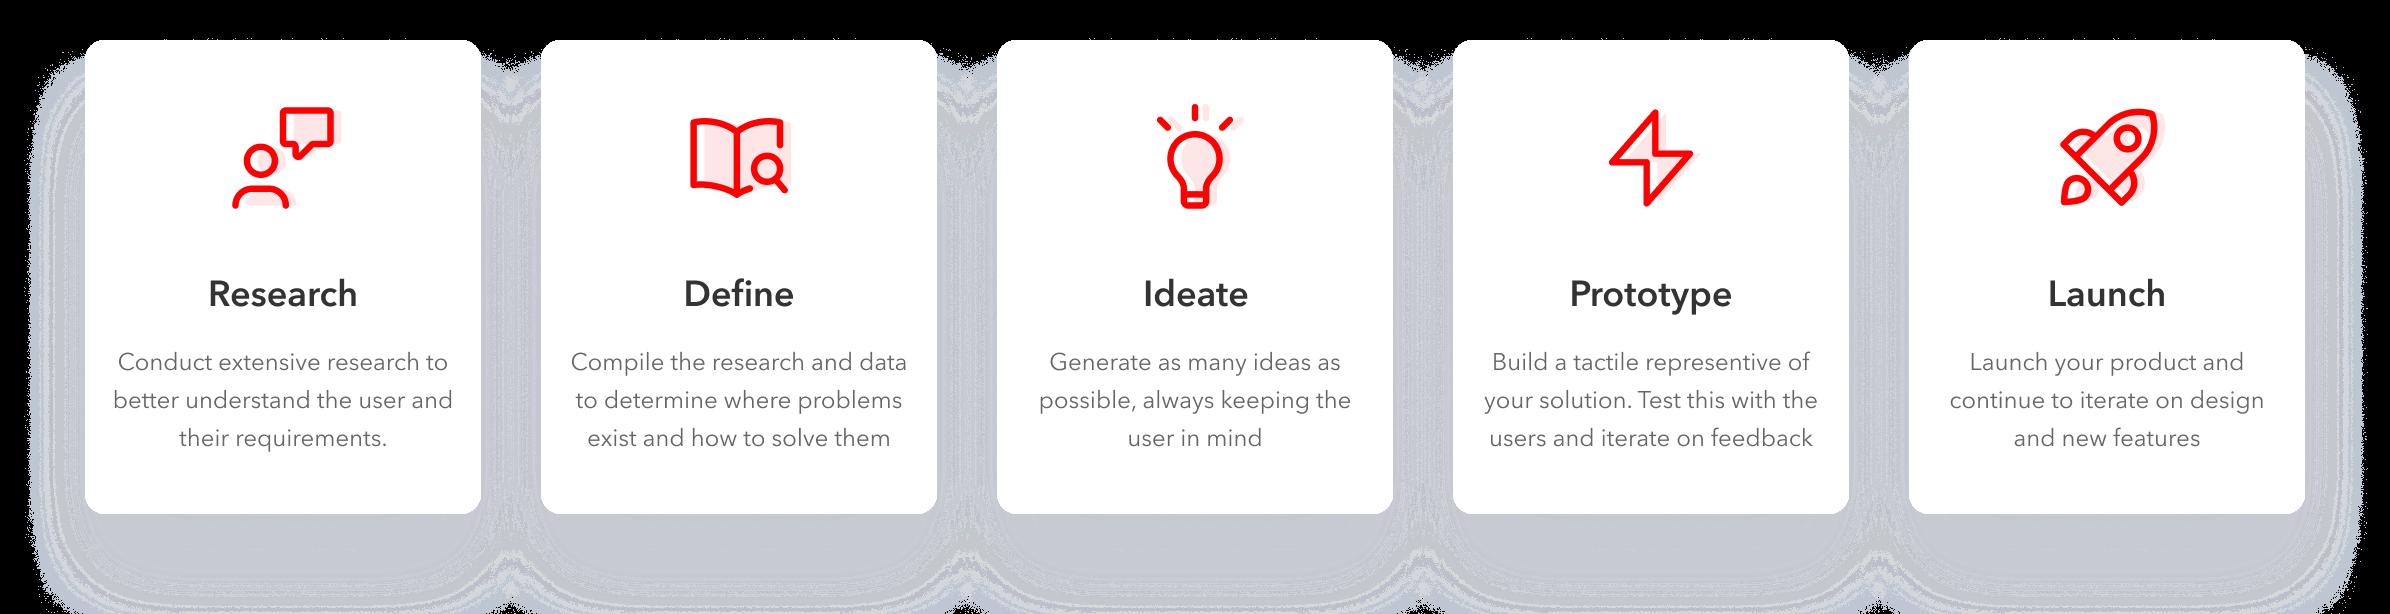 covet-designprocess@2x